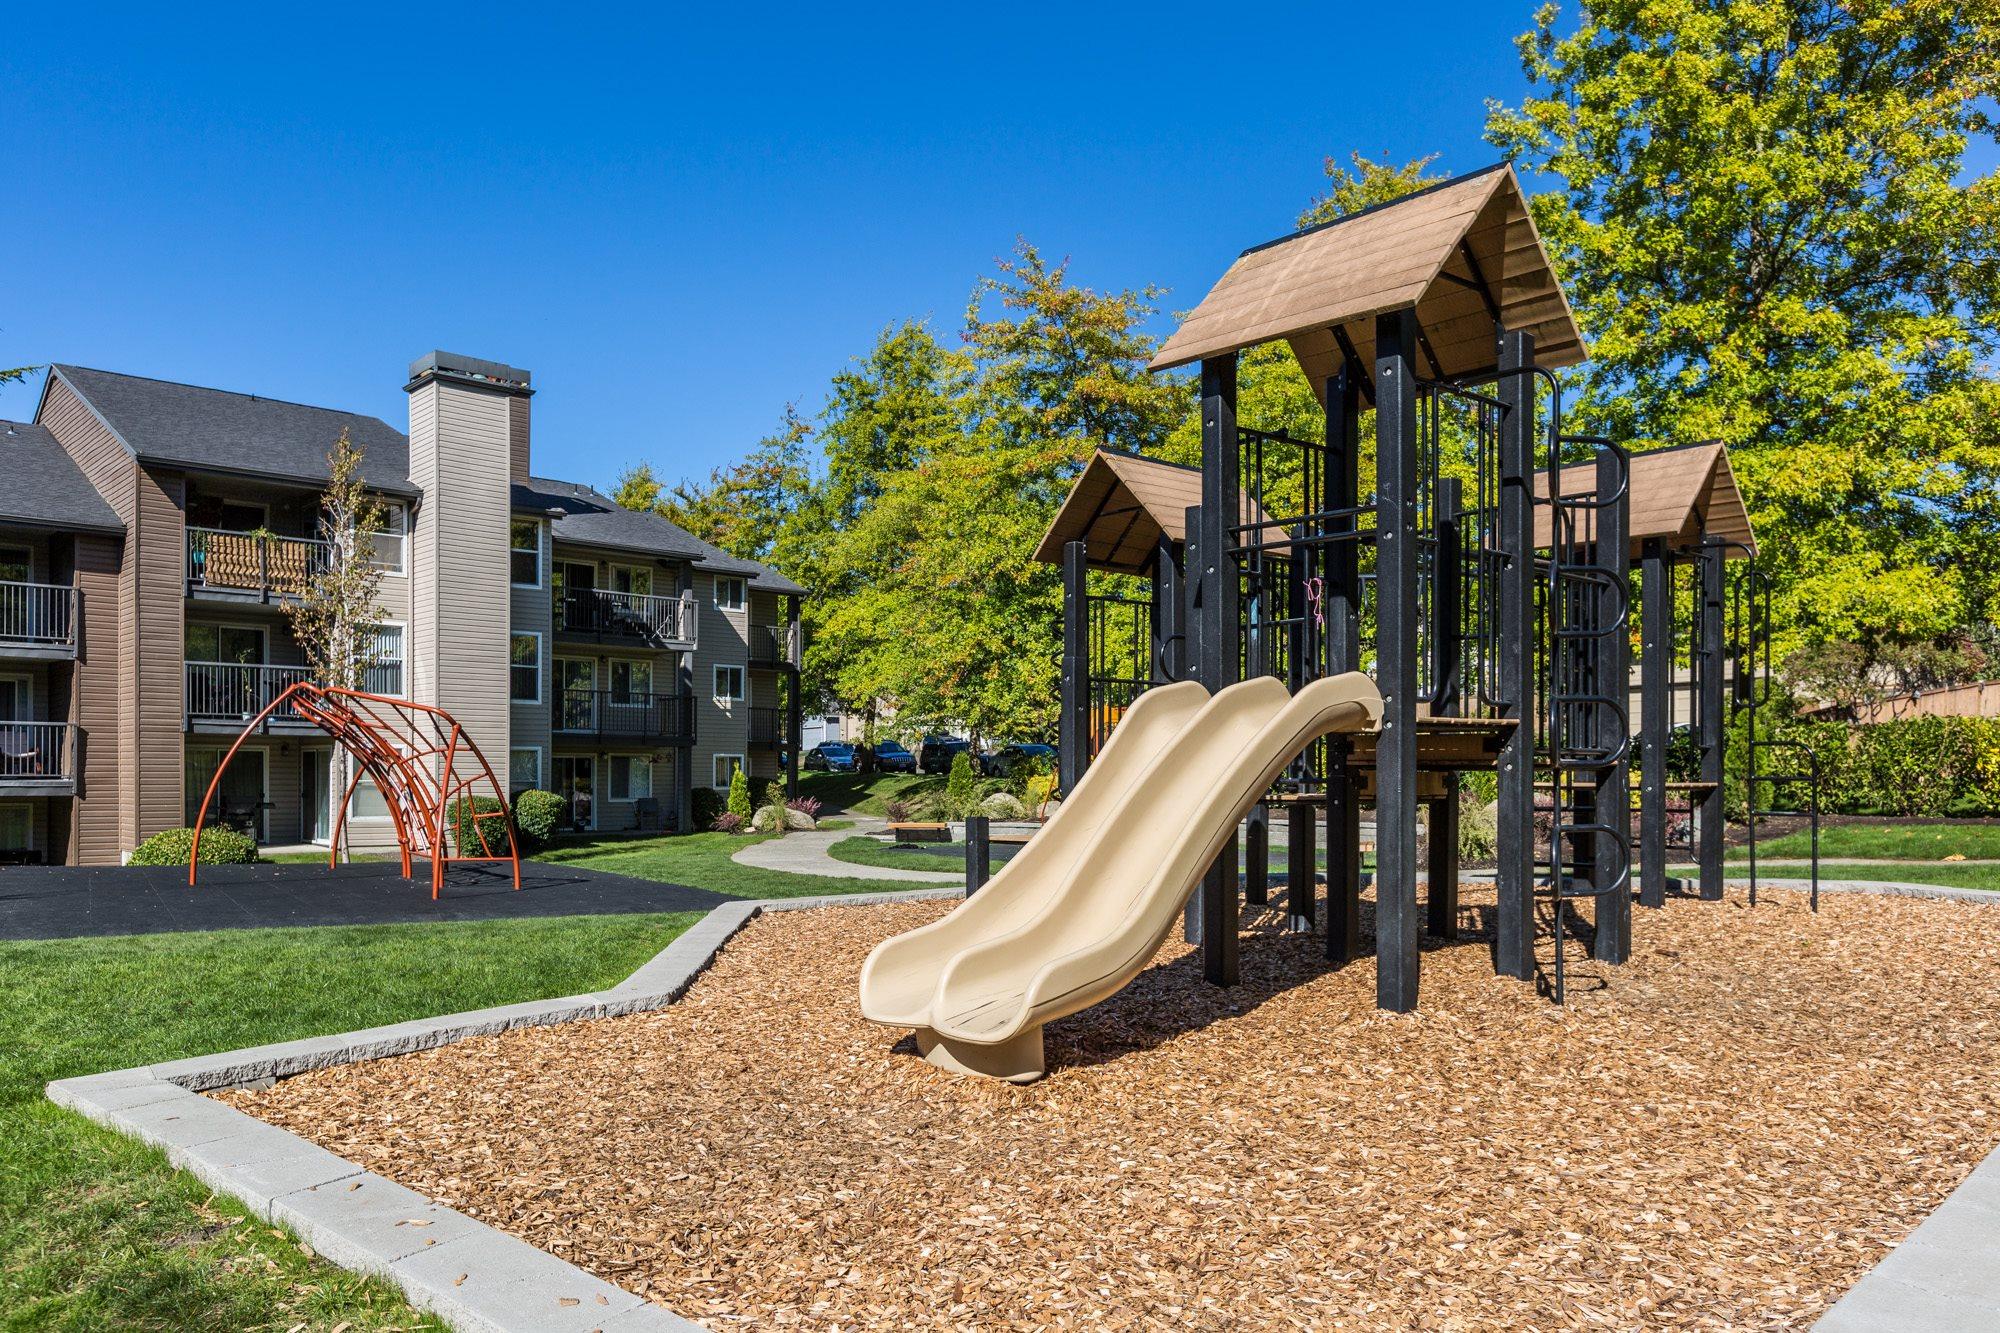 Playground at The Fairways Apartments, Tacoma, WA,98422